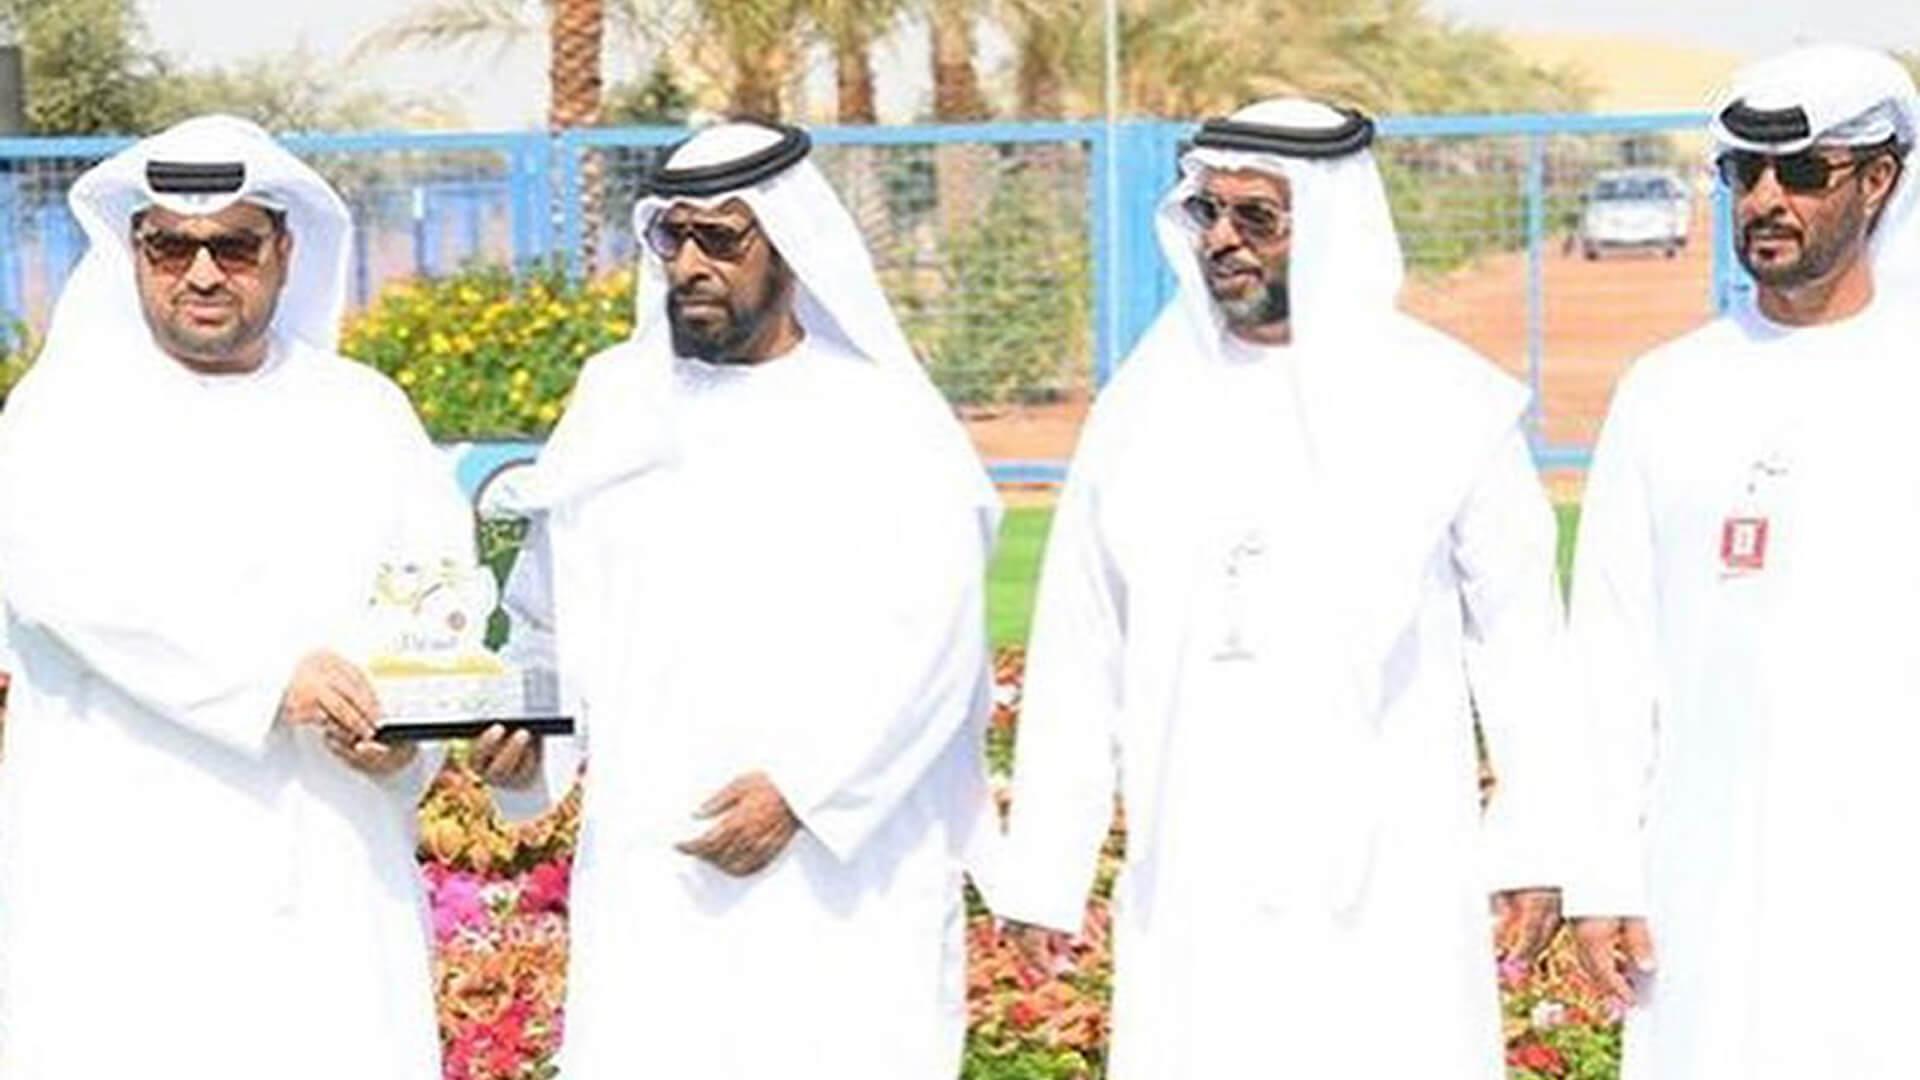 Sultan Bin Zayed Heritage Festival